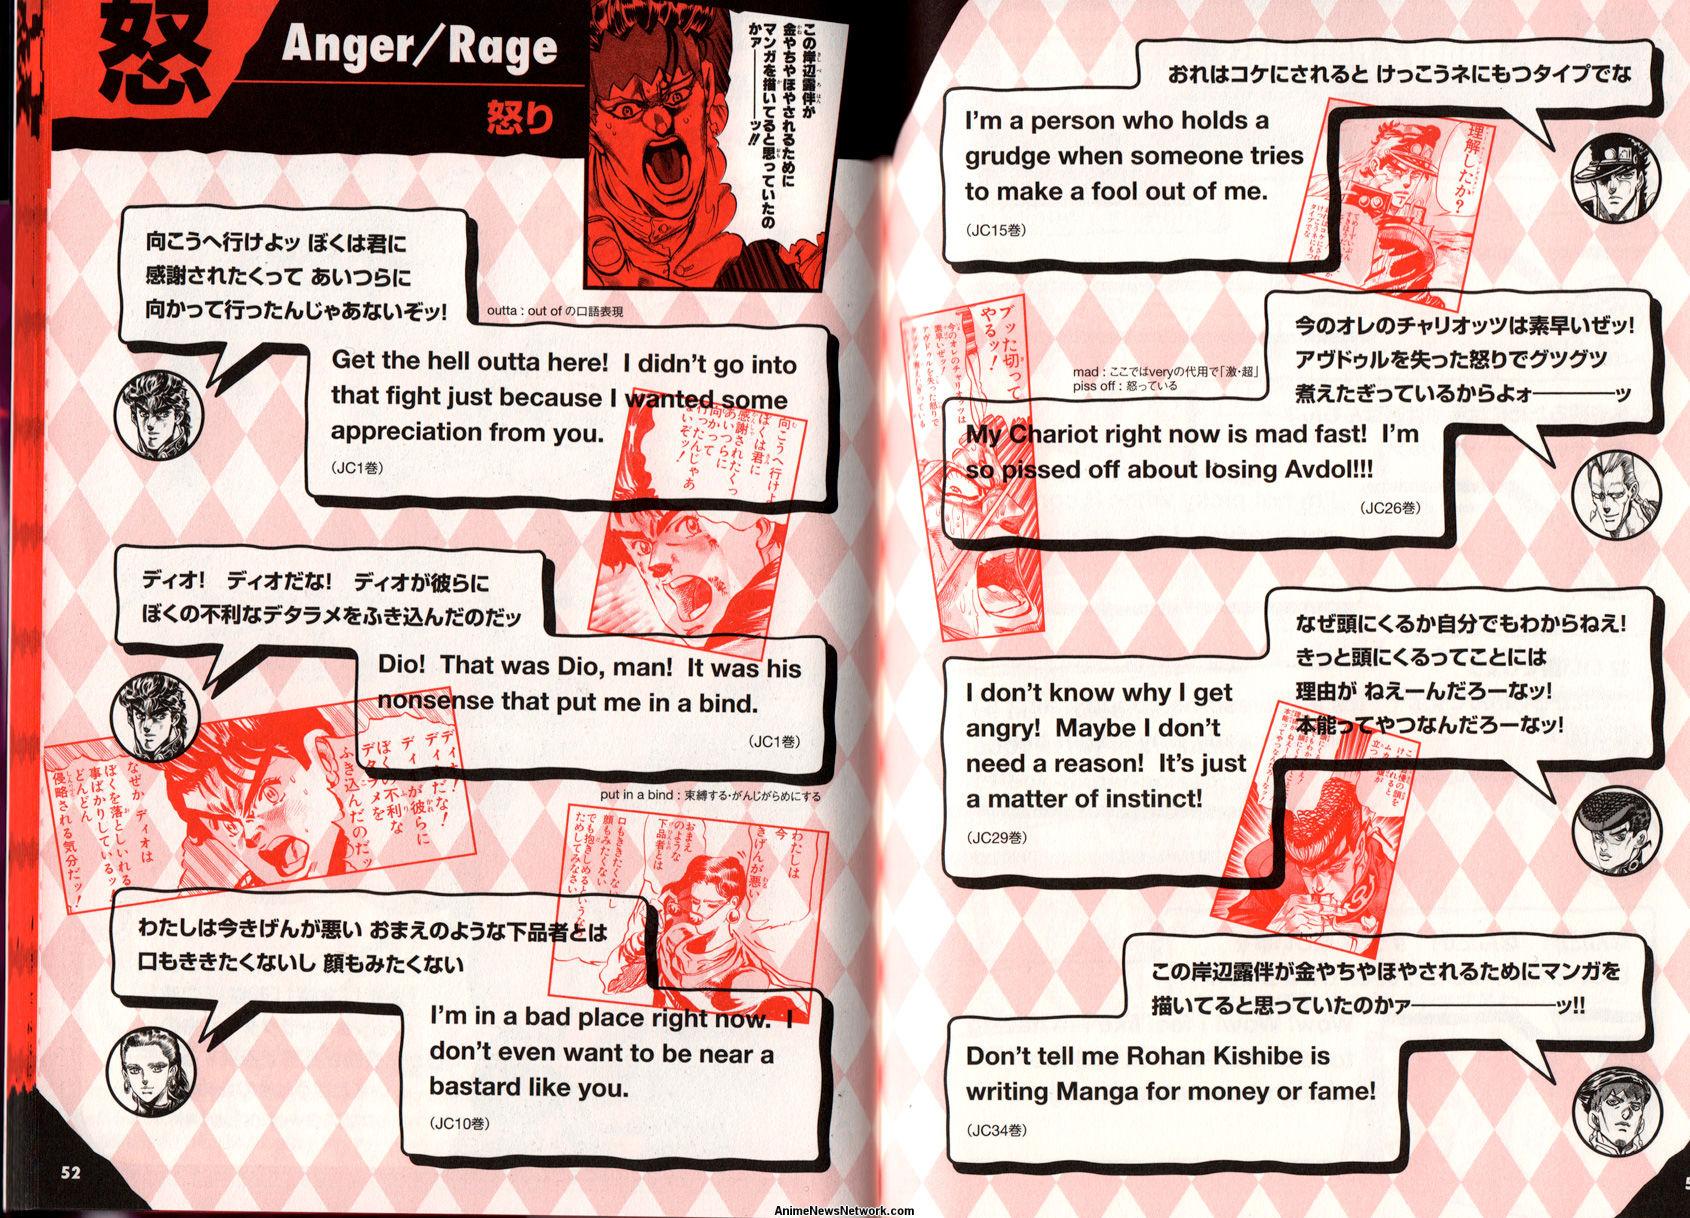 Learn English with Jojo's Bizarre Adventure! - House of 1000 Manga